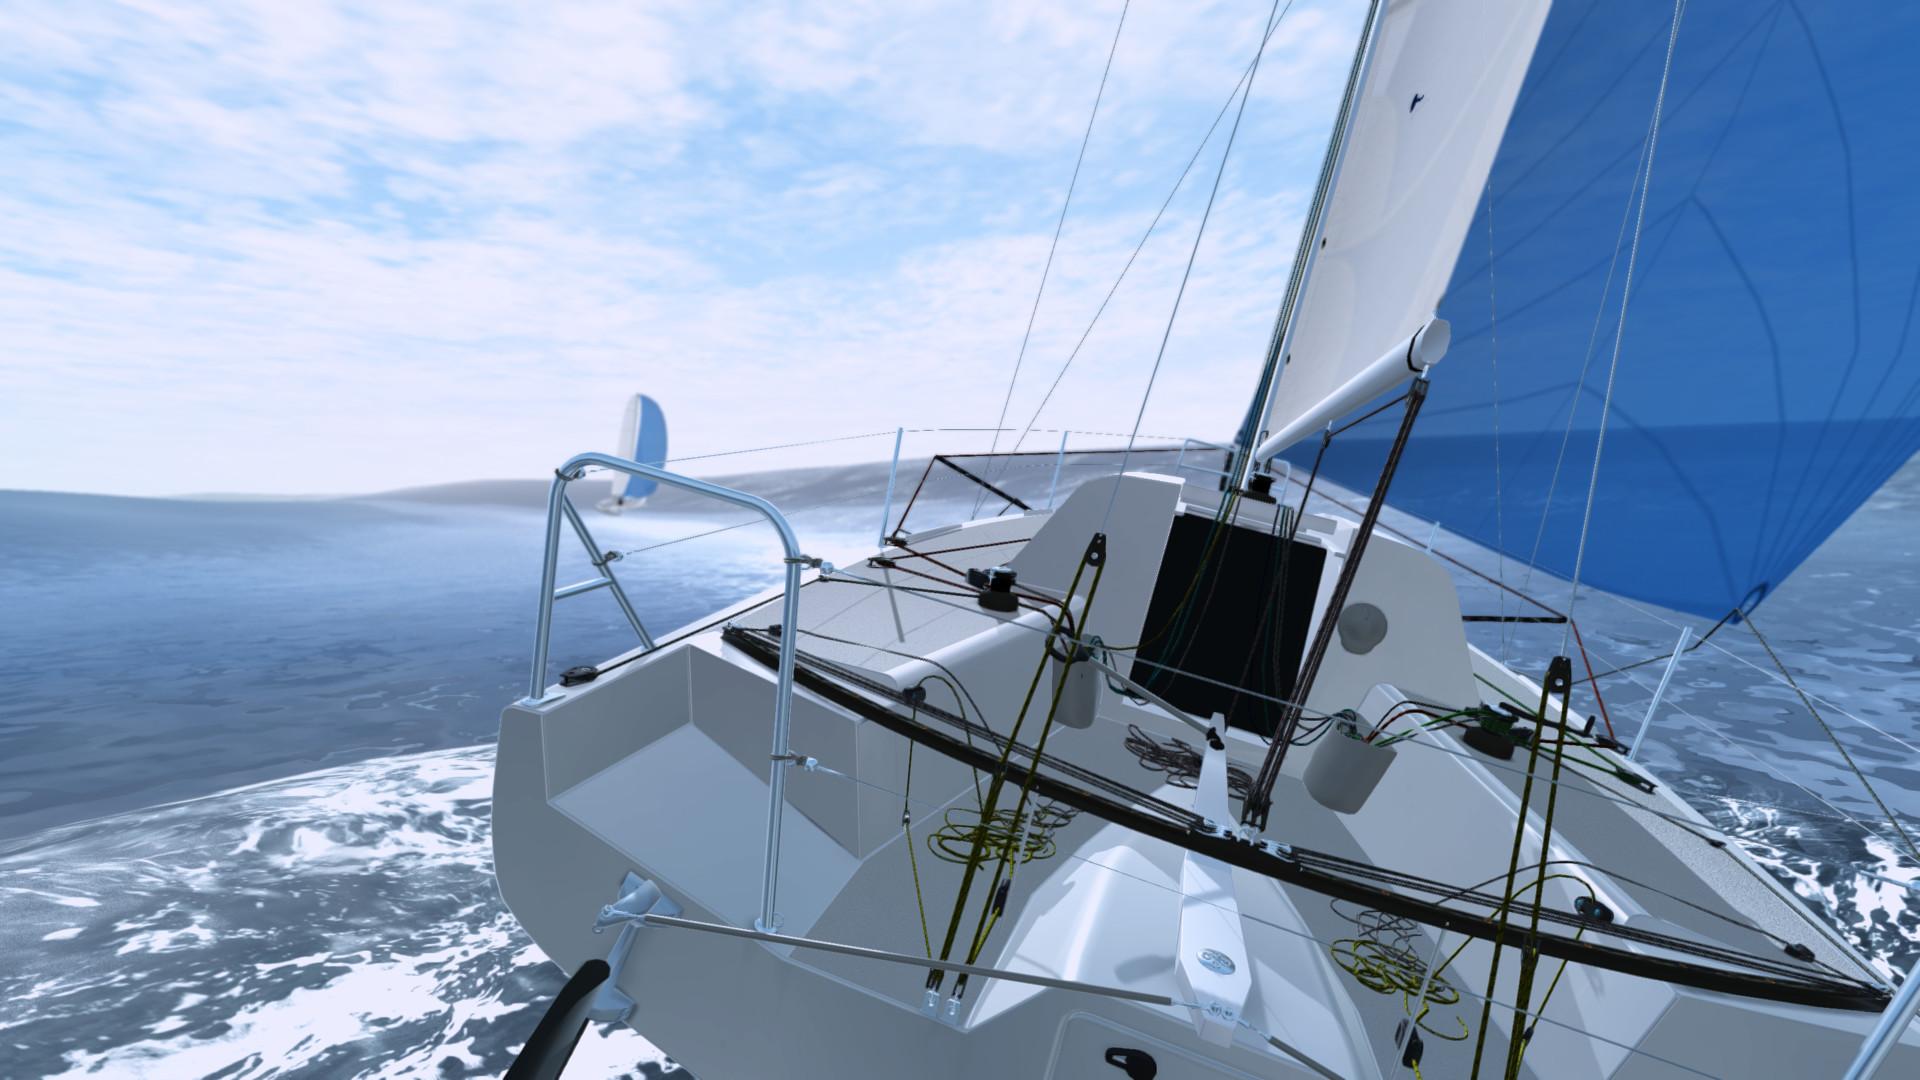 Amazon com: Sailaway - The Sailing Simulator [Online Game